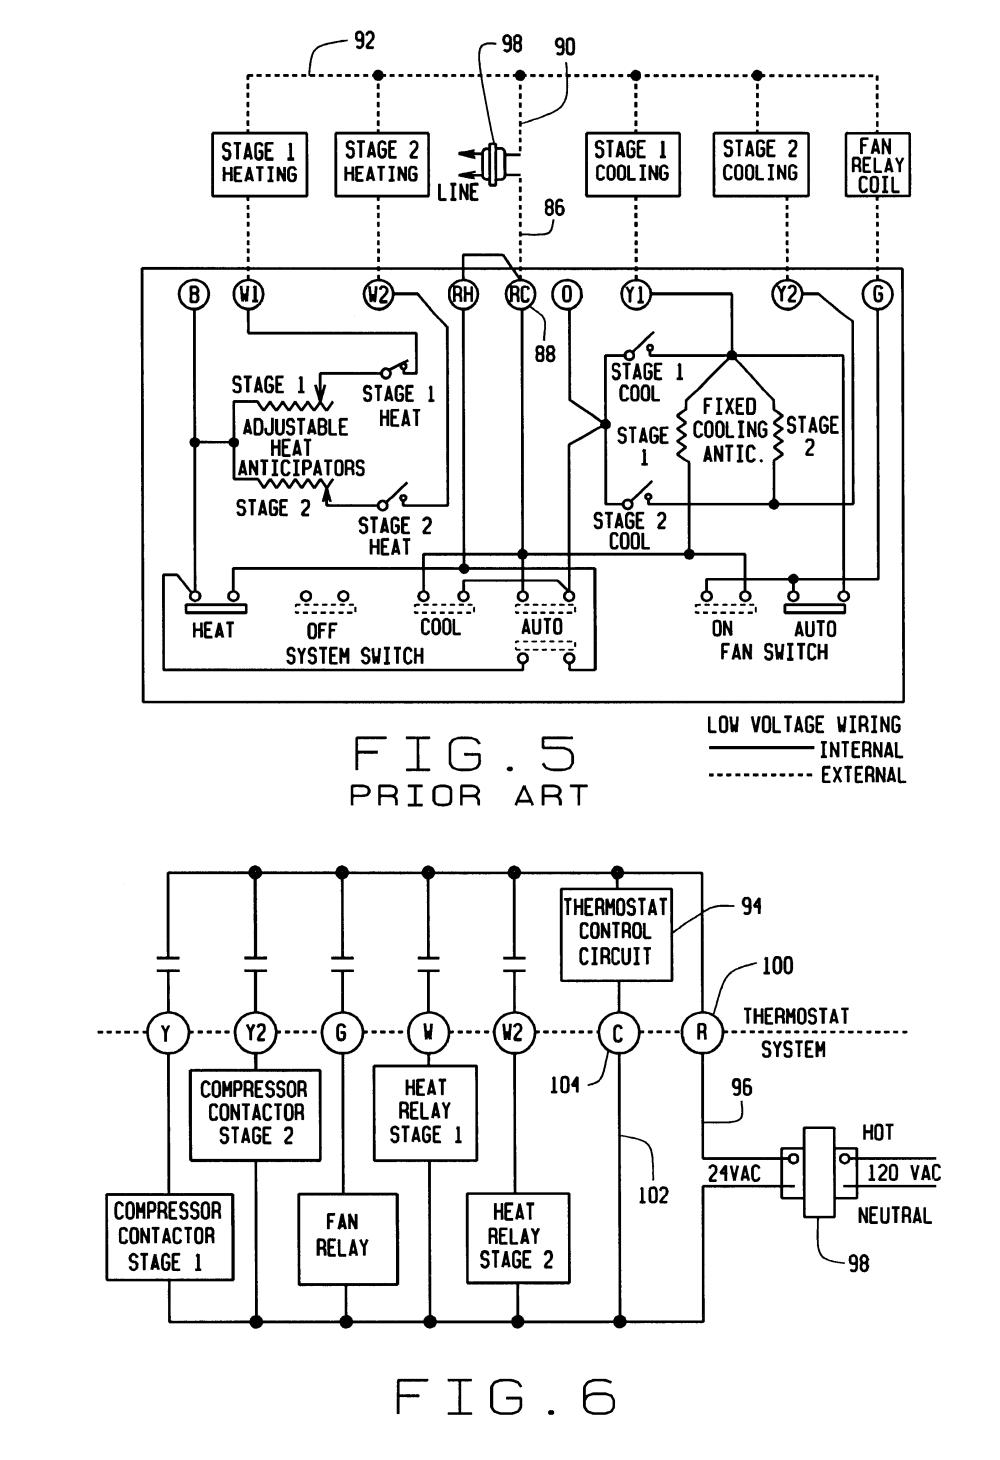 medium resolution of columbus electric thermostat wiring diagram simple wiring diagram rh 62 mara cujas de wiring diagram single baseboard thermostat wiring diagram single